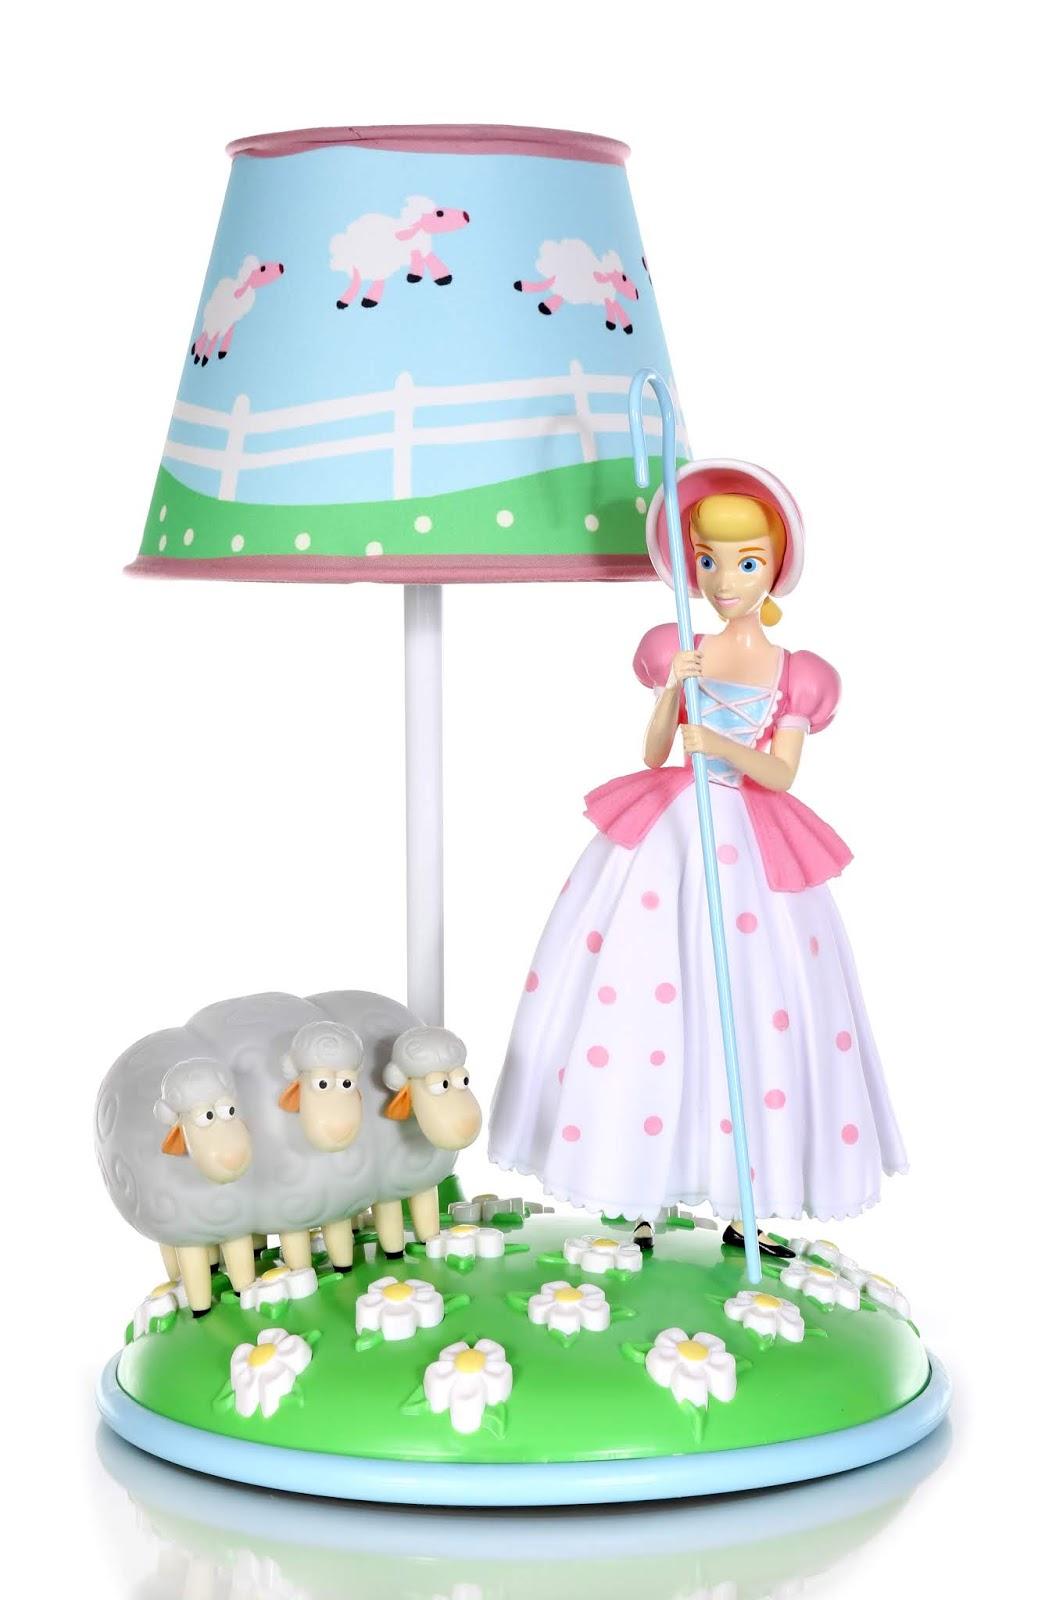 Dan The Pixar Fan Toy Story 4 Bo Peep And Sheep Table